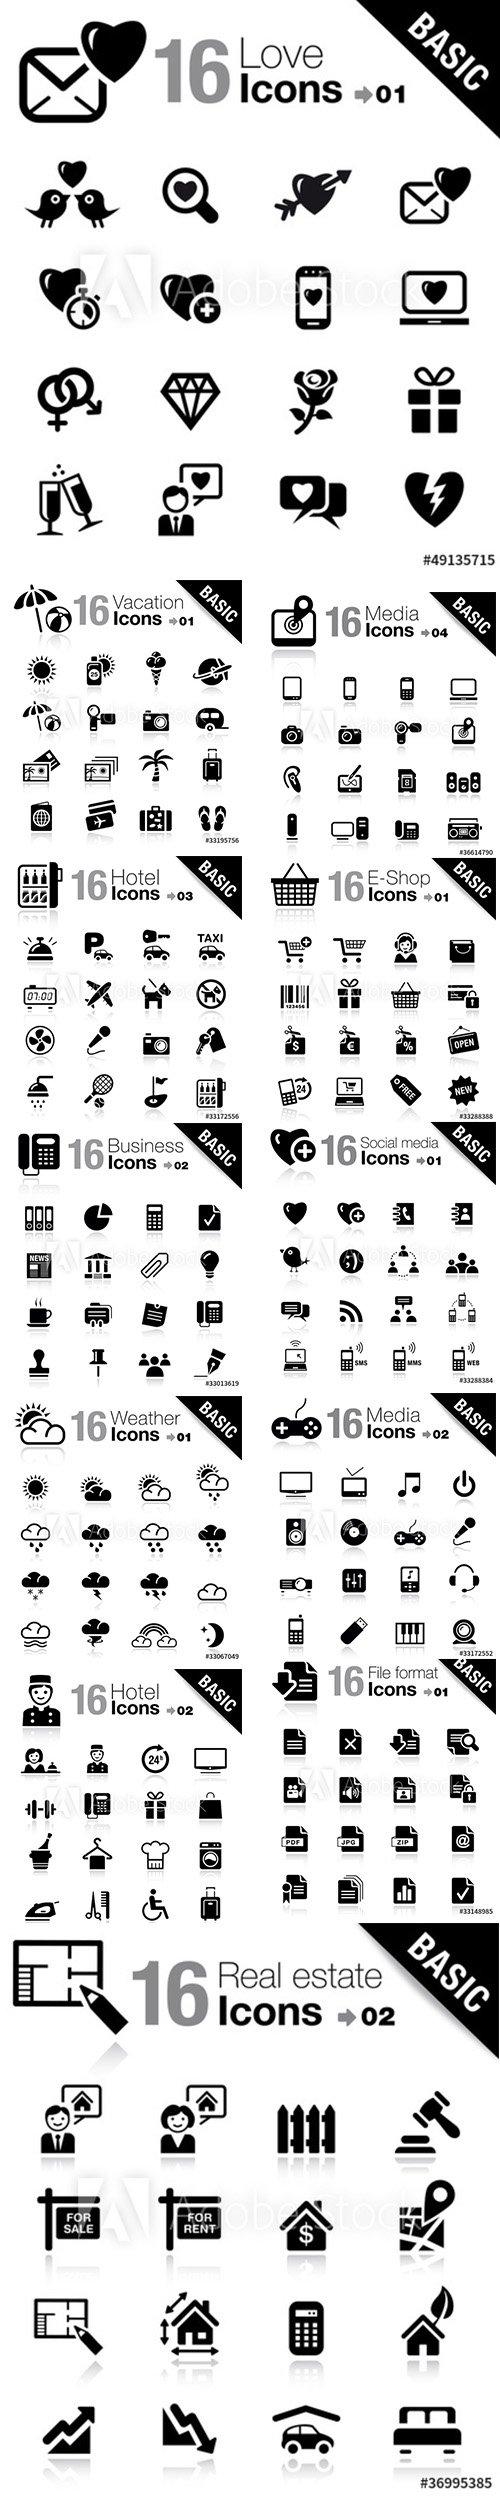 Basic Icons Pack Vol 4